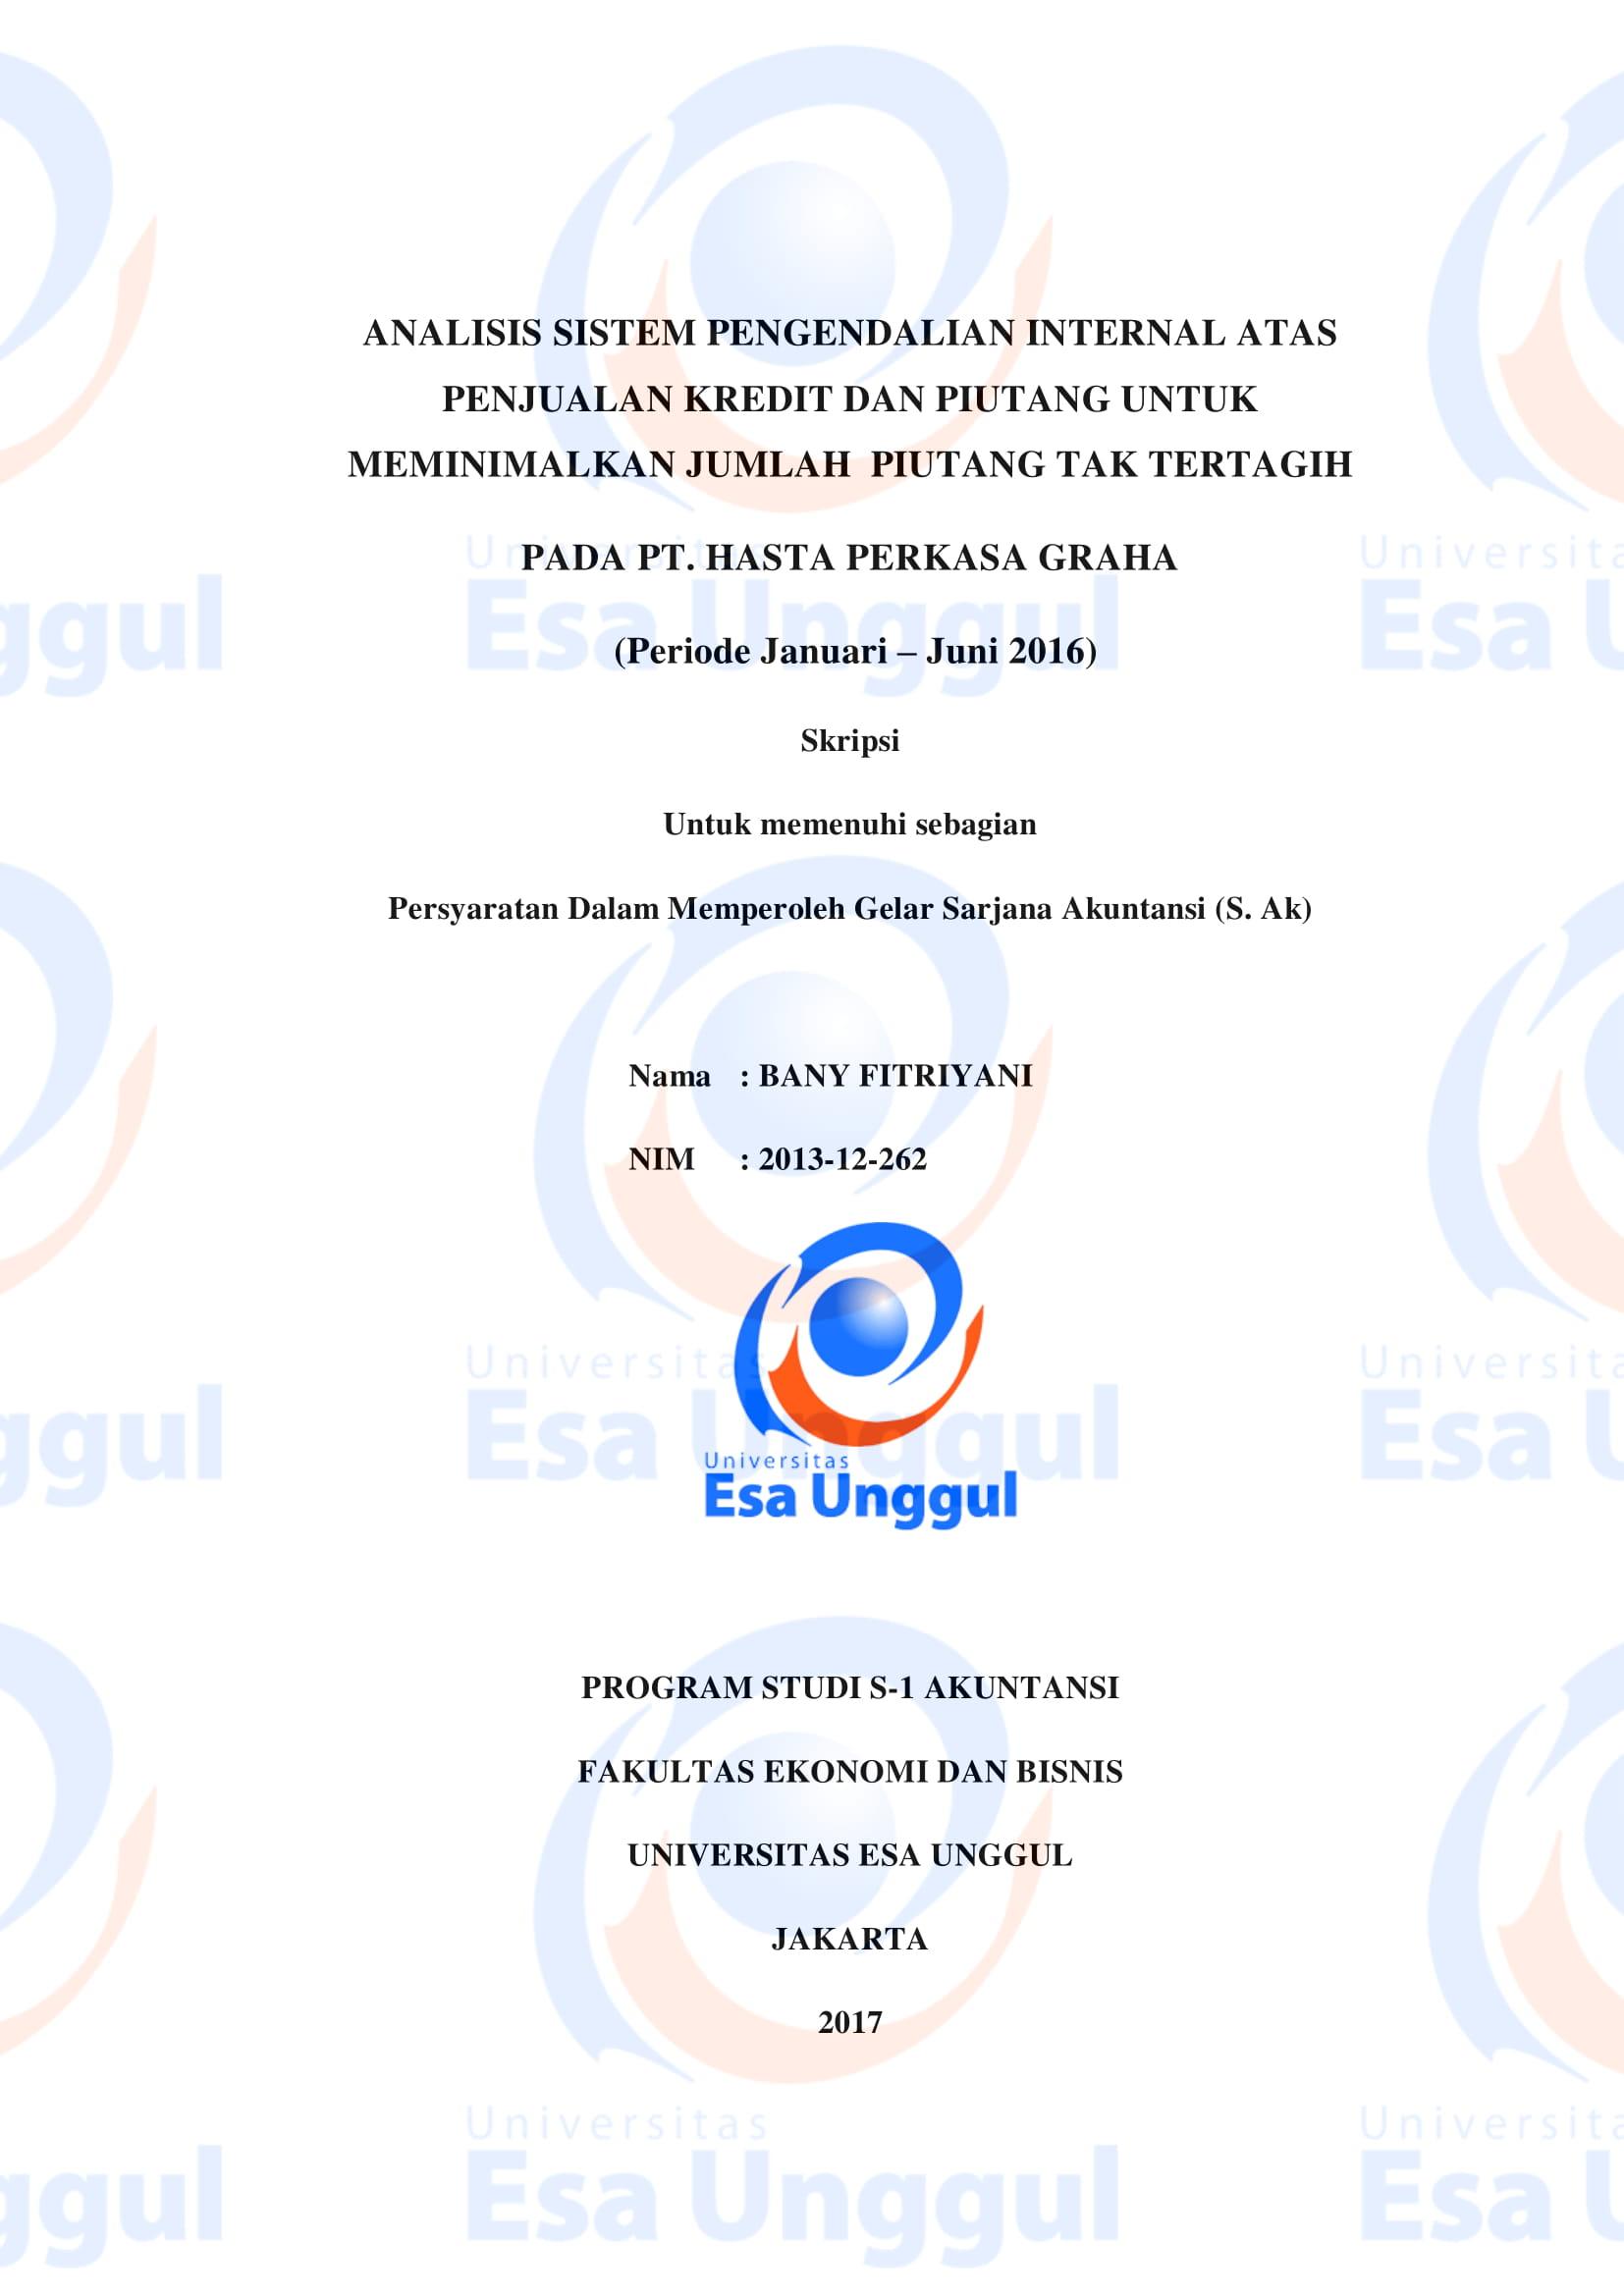 Analisis Sistem Pengendalian Internal atas Penjualan Kredit dan Piutang untuk Meminimalkan Jumlah Piutang Tak Tertagih pada PT. Hasta Perkasa Graha (Periode Januari  – Juni 2016)